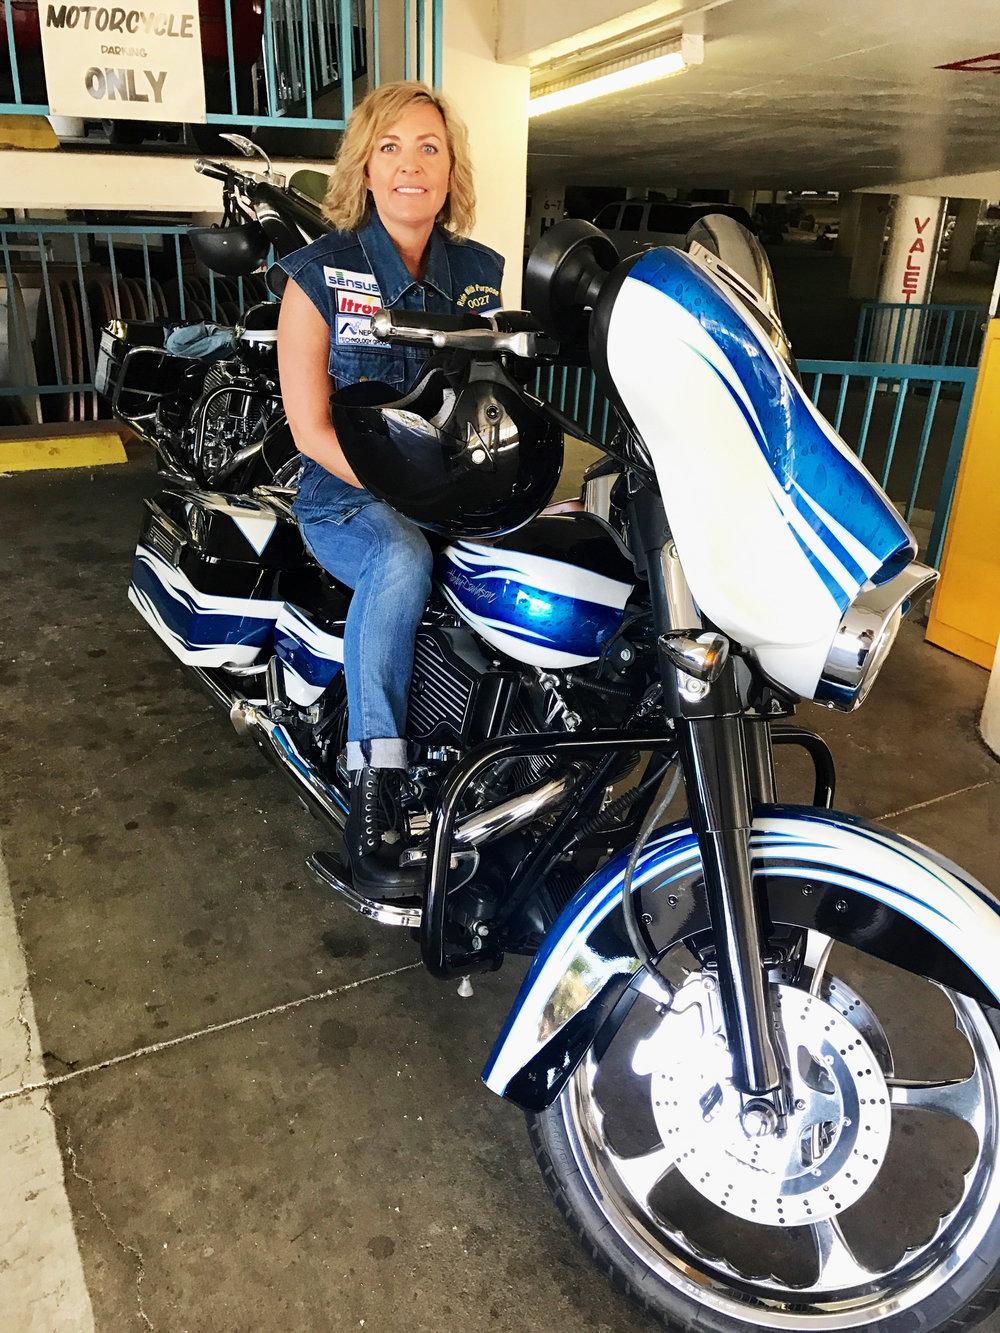 V&A's President,Debra L. Kaye, PE - Ready to #ridewithpurpose